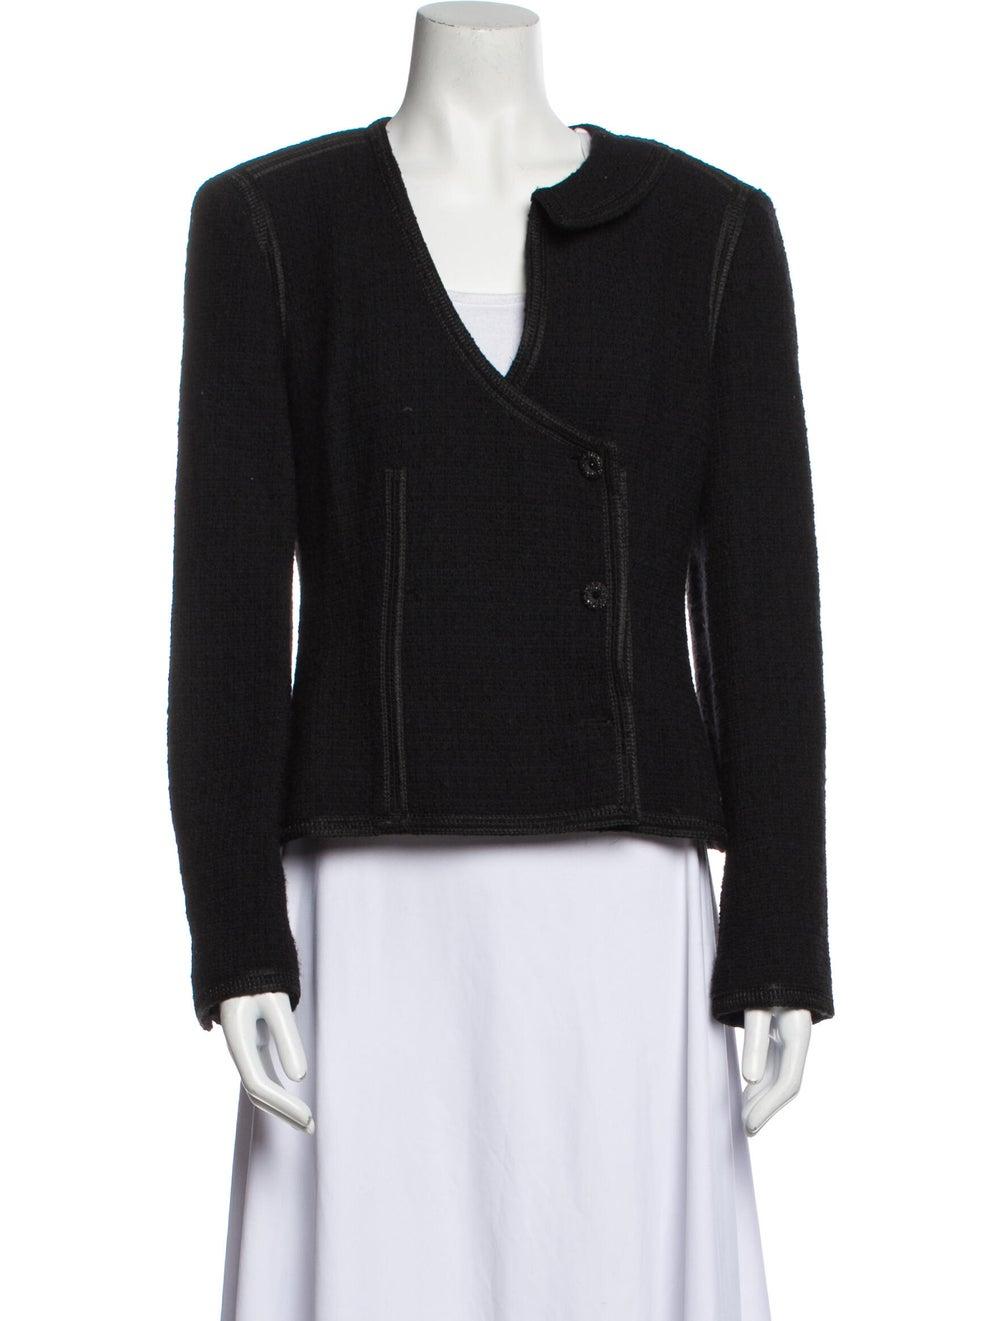 Chanel Vintage 2002 Evening Jacket Wool - image 1